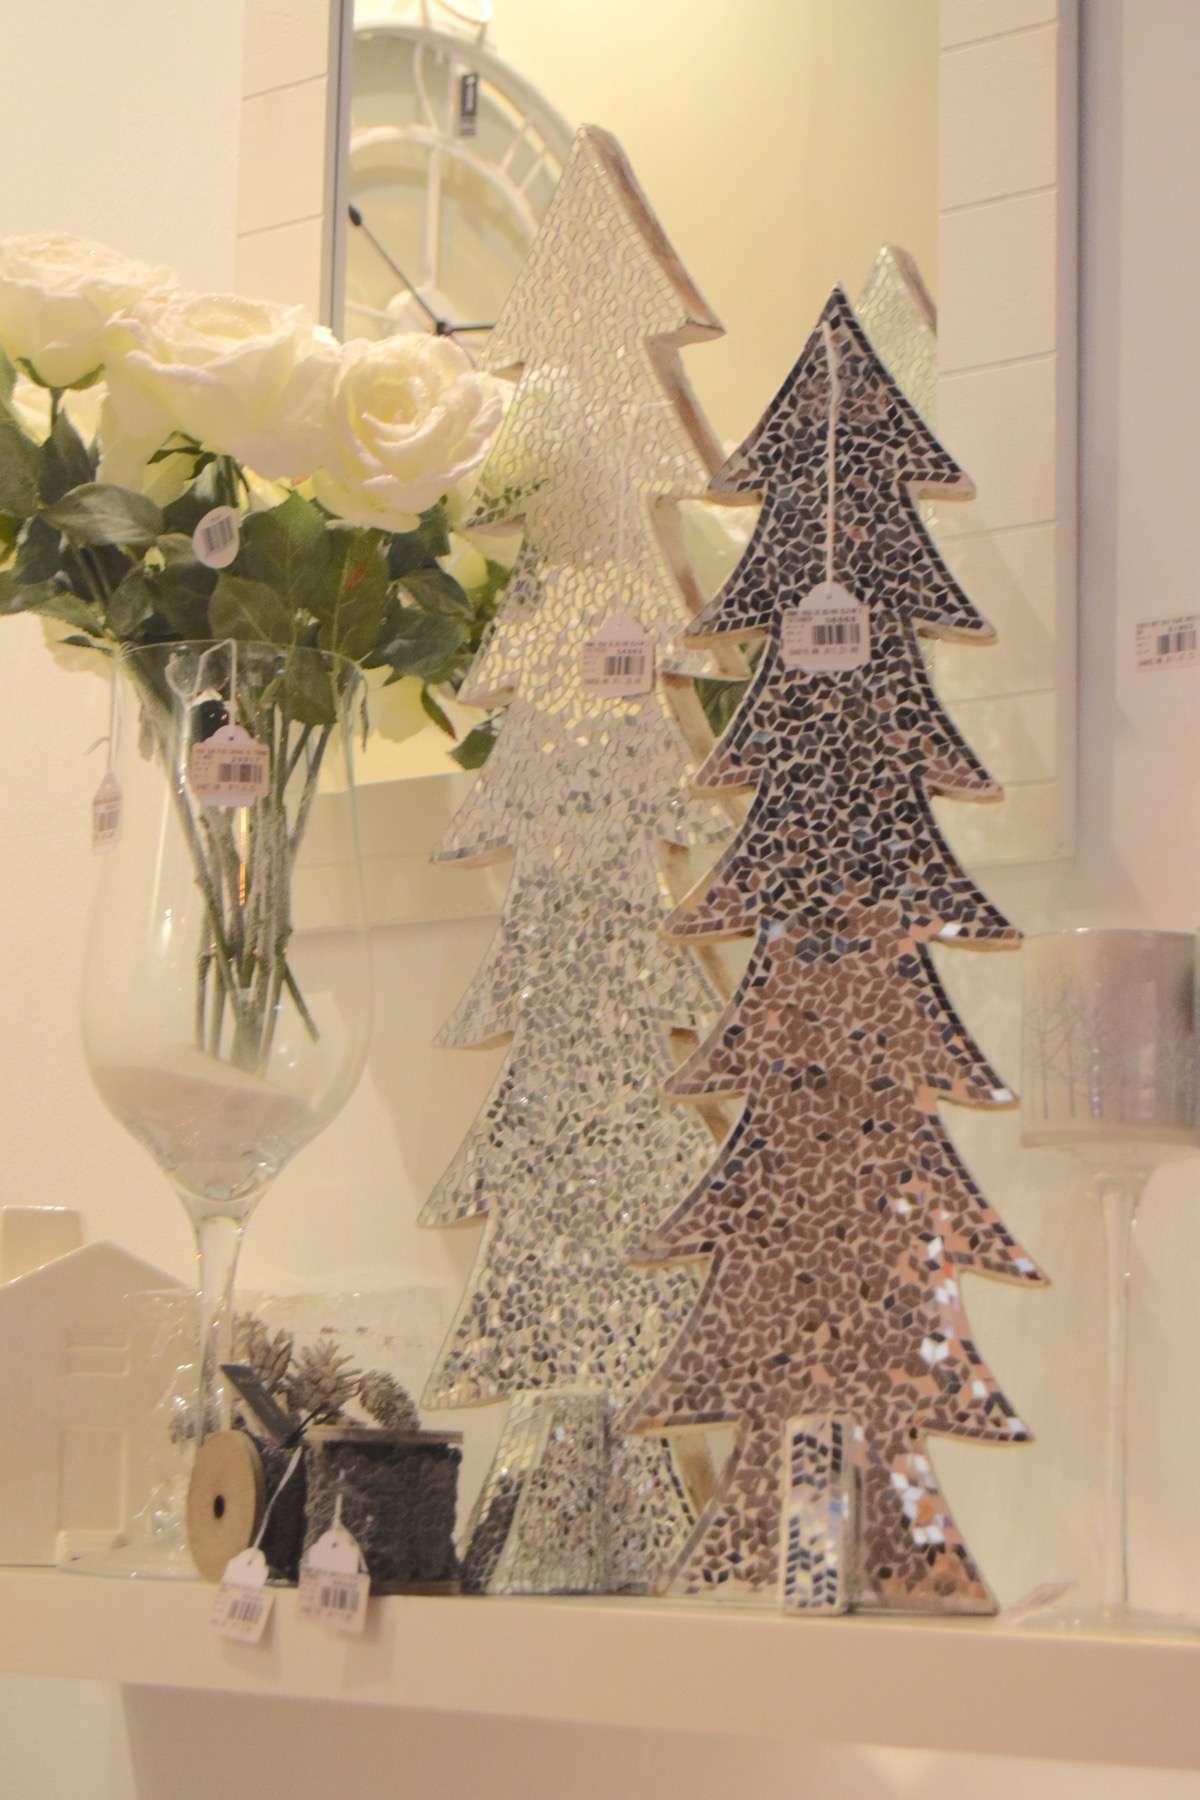 "15-original-Christmas-trees ""width ="" 1200 ""height ="" 1800 ""srcset ="" https://navidad.es/wp-content/uploads/2009/12/15-arboles-de-navidad-originales .jpg 1200w, https://navidad.es/wp-content/uploads/2009/12/15-arboles-de-navidad-originales-200x300.jpg 200w, https://navidad.es/wp-content/uploads /2009/12/15-arboles-de-navidad-originales-768x1152.jpg 768w, https://navidad.es/wp-content/uploads/2009/12/15-arboles-de-navidad-originales-683x1024. jpg 683w, https://navidad.es/wp-content/uploads/2009/12/15-arboles-de-navidad-originales-696x1044.jpg 696w, https://navidad.es/wp-content/uploads/ 2009/12/15-original-Christmas-trees-1068x1602.jpg 1068w, https://navidad.es/wp-content/uploads/2009/12/15-arboles-de-navidad-originales-280x420.jpg 280w ""tailles ="" (largeur maximale: 1200px) 100vw, 1200px ""/></p> <h2><span class="